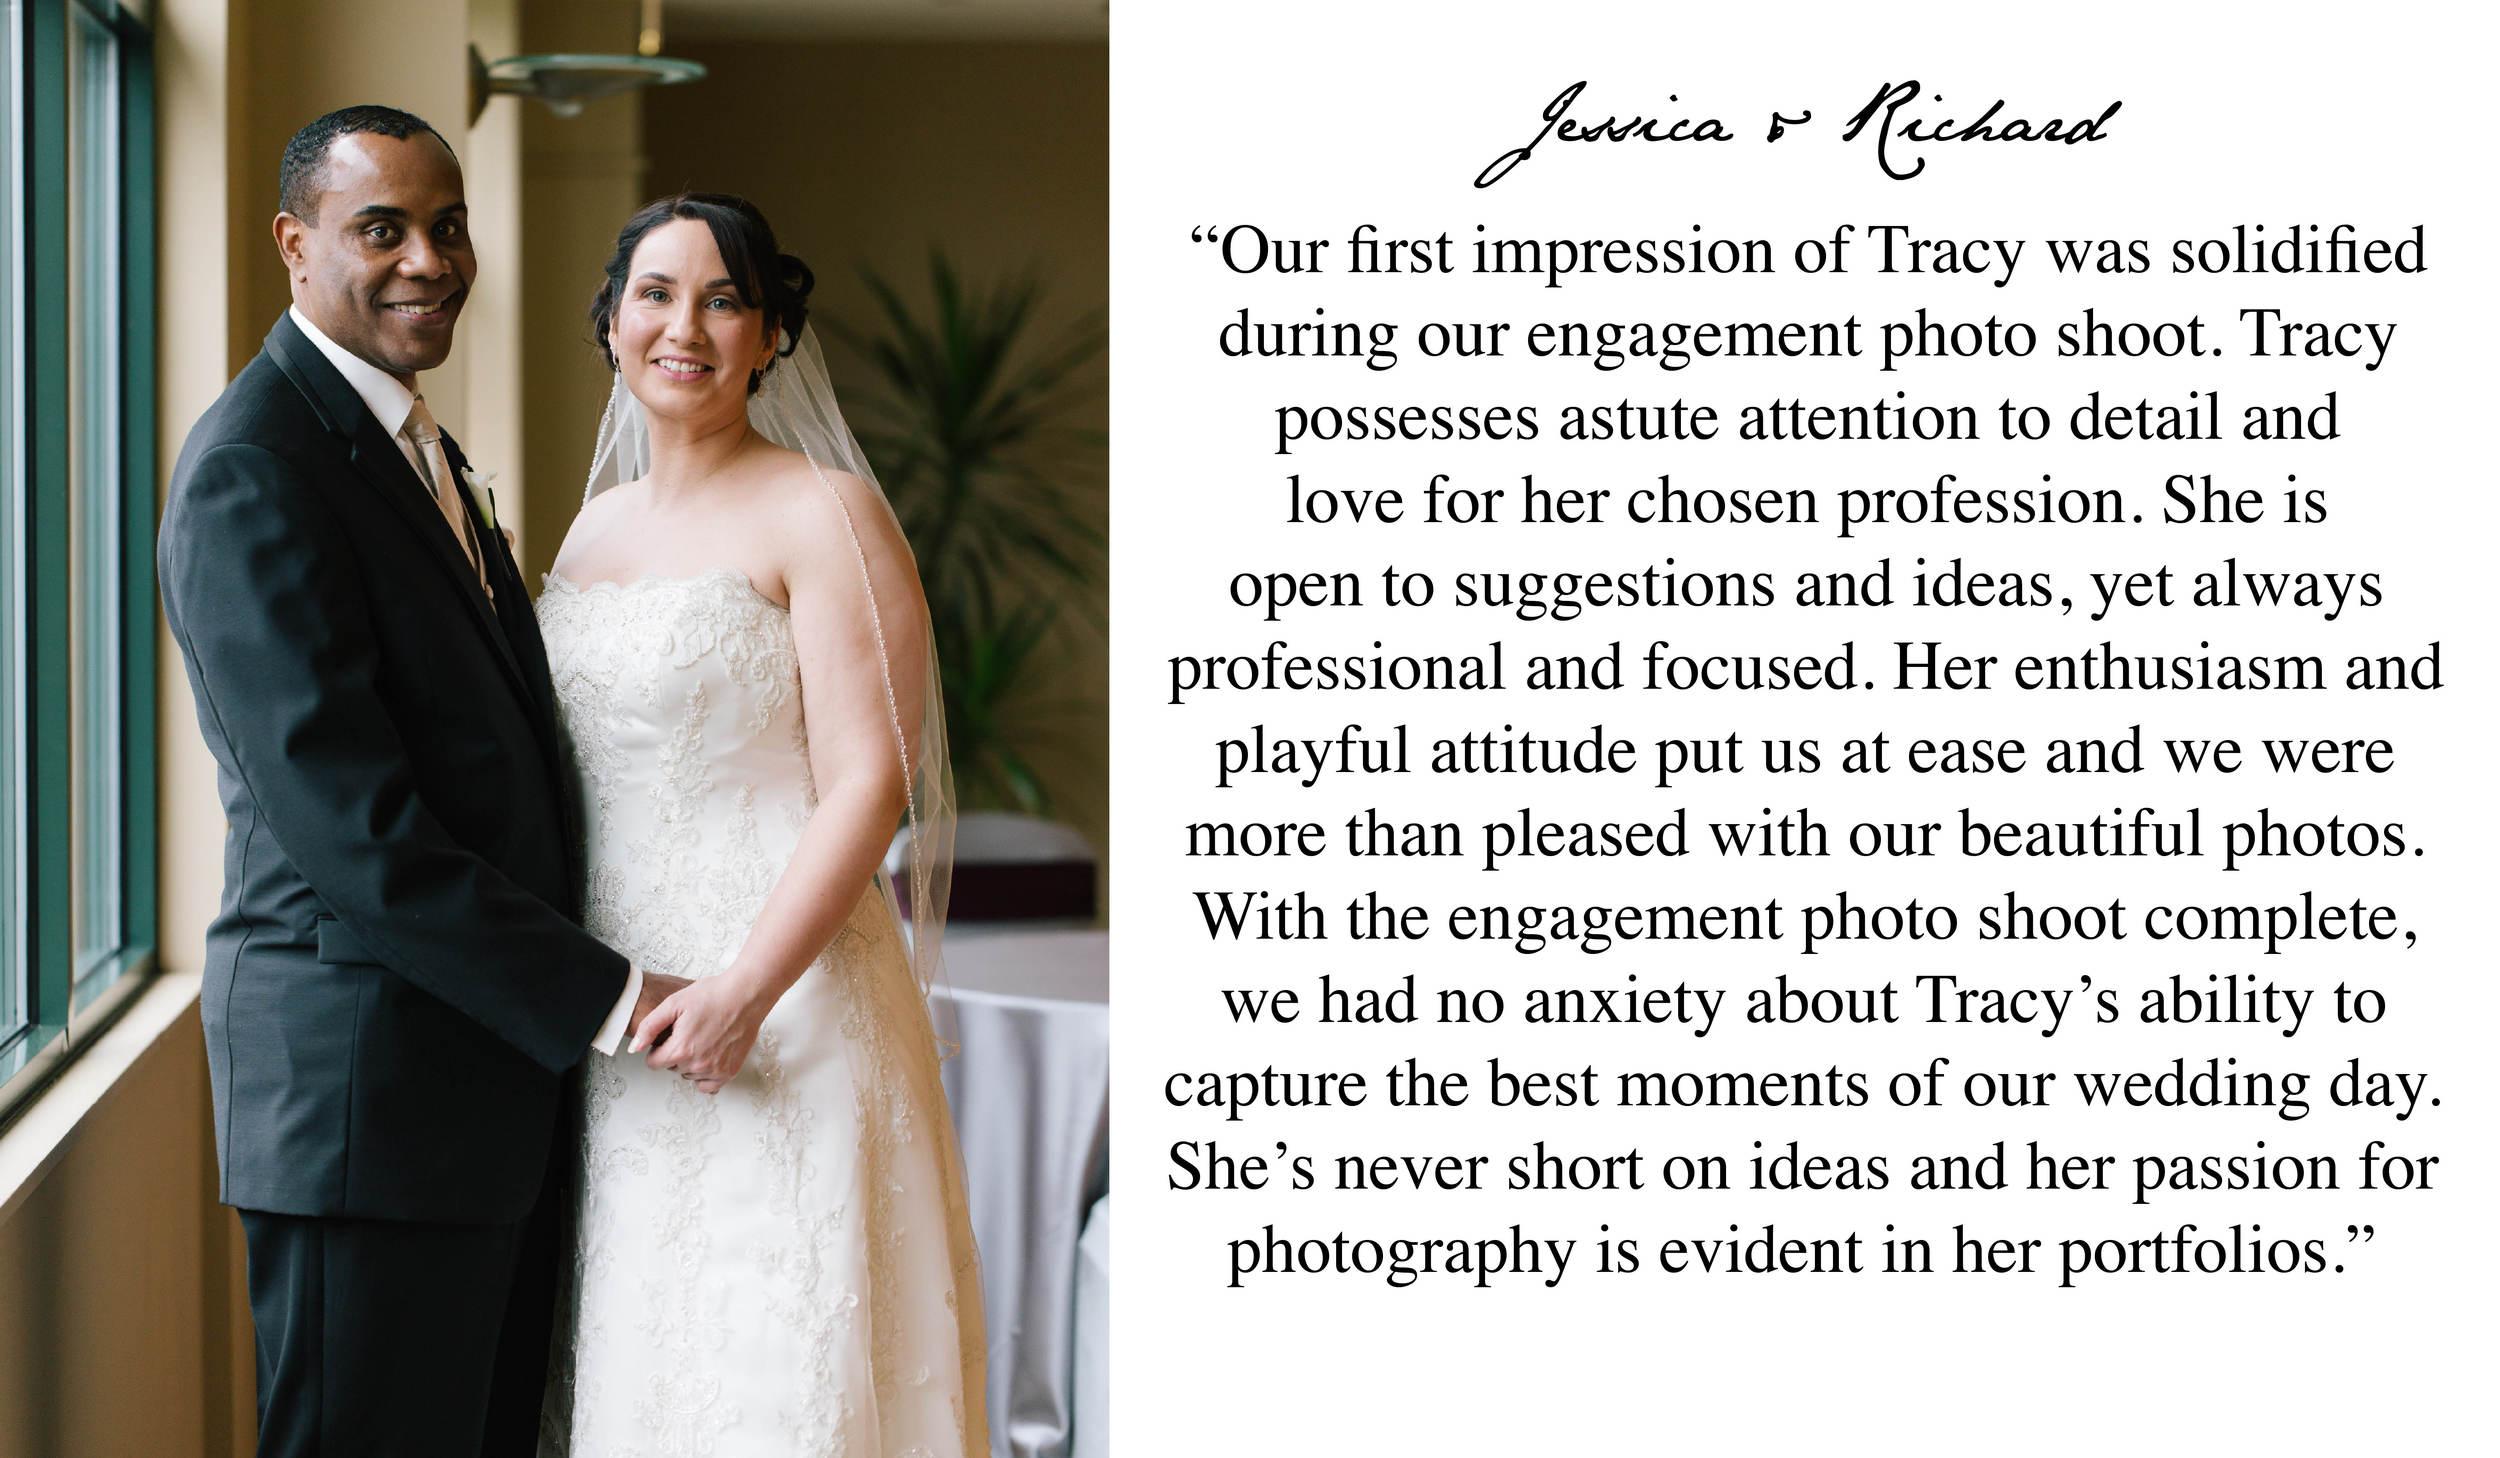 Boston Wedding Photographer 5 Star Review